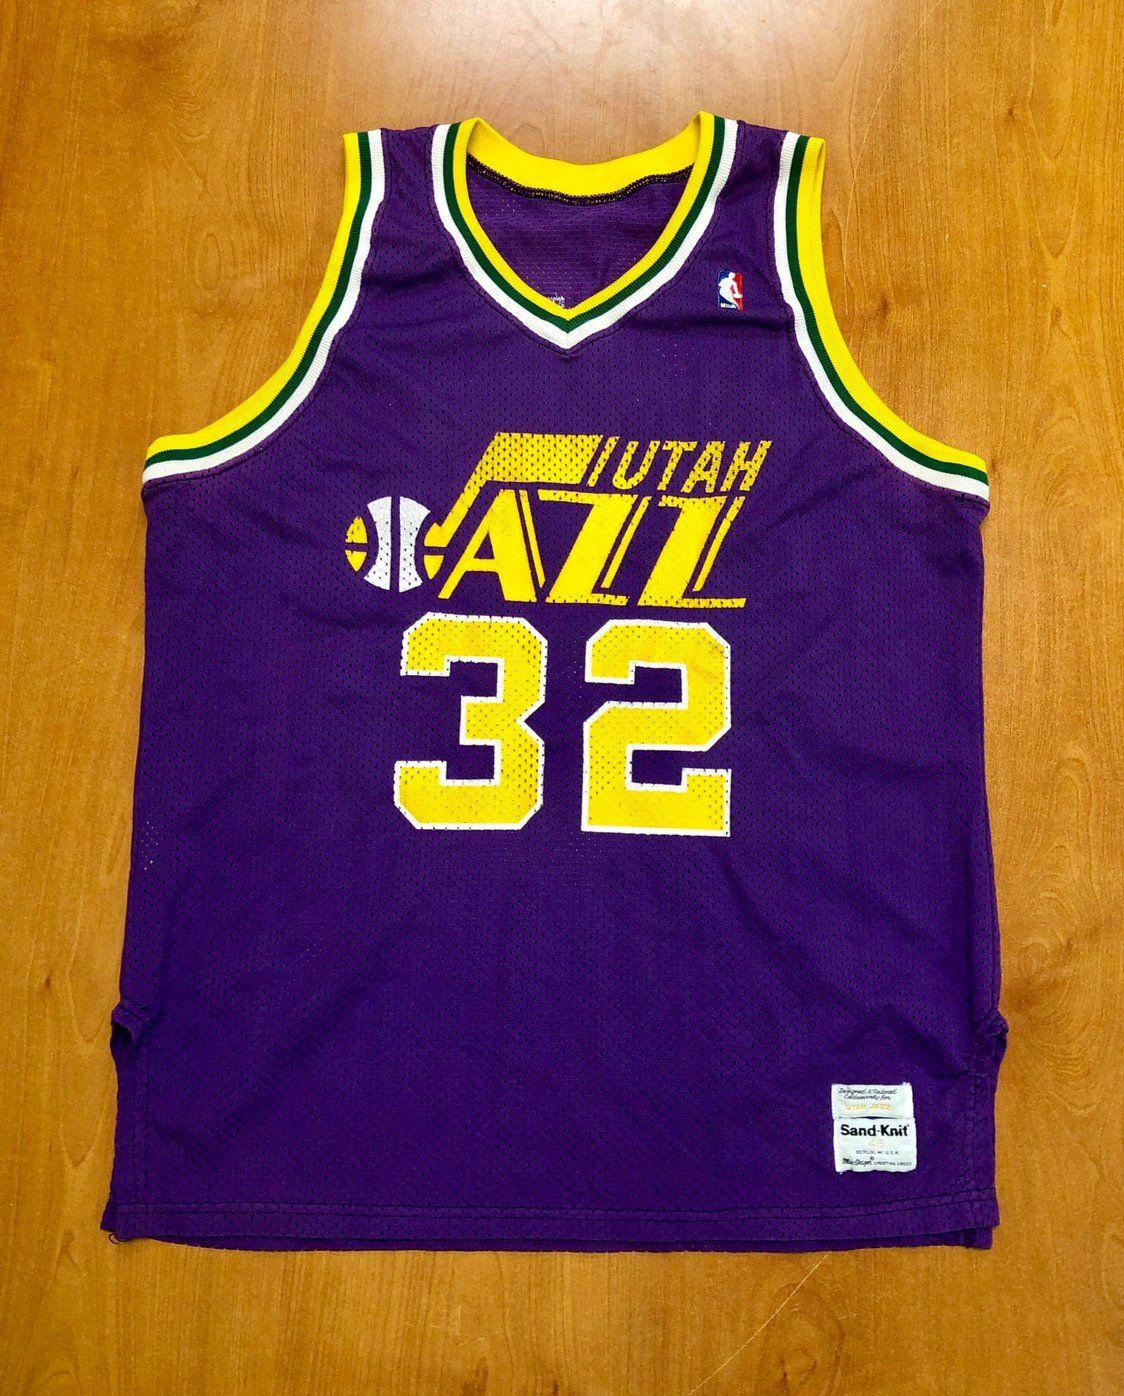 e443469a6f5d60 Vintage 1980s Karl Malone Utah Jazz Sand Knit Authentic Jersey Size 46 pete  maravich andrei kirilenko new orleans nba finals champion by  BroadwayVintageLLC ...